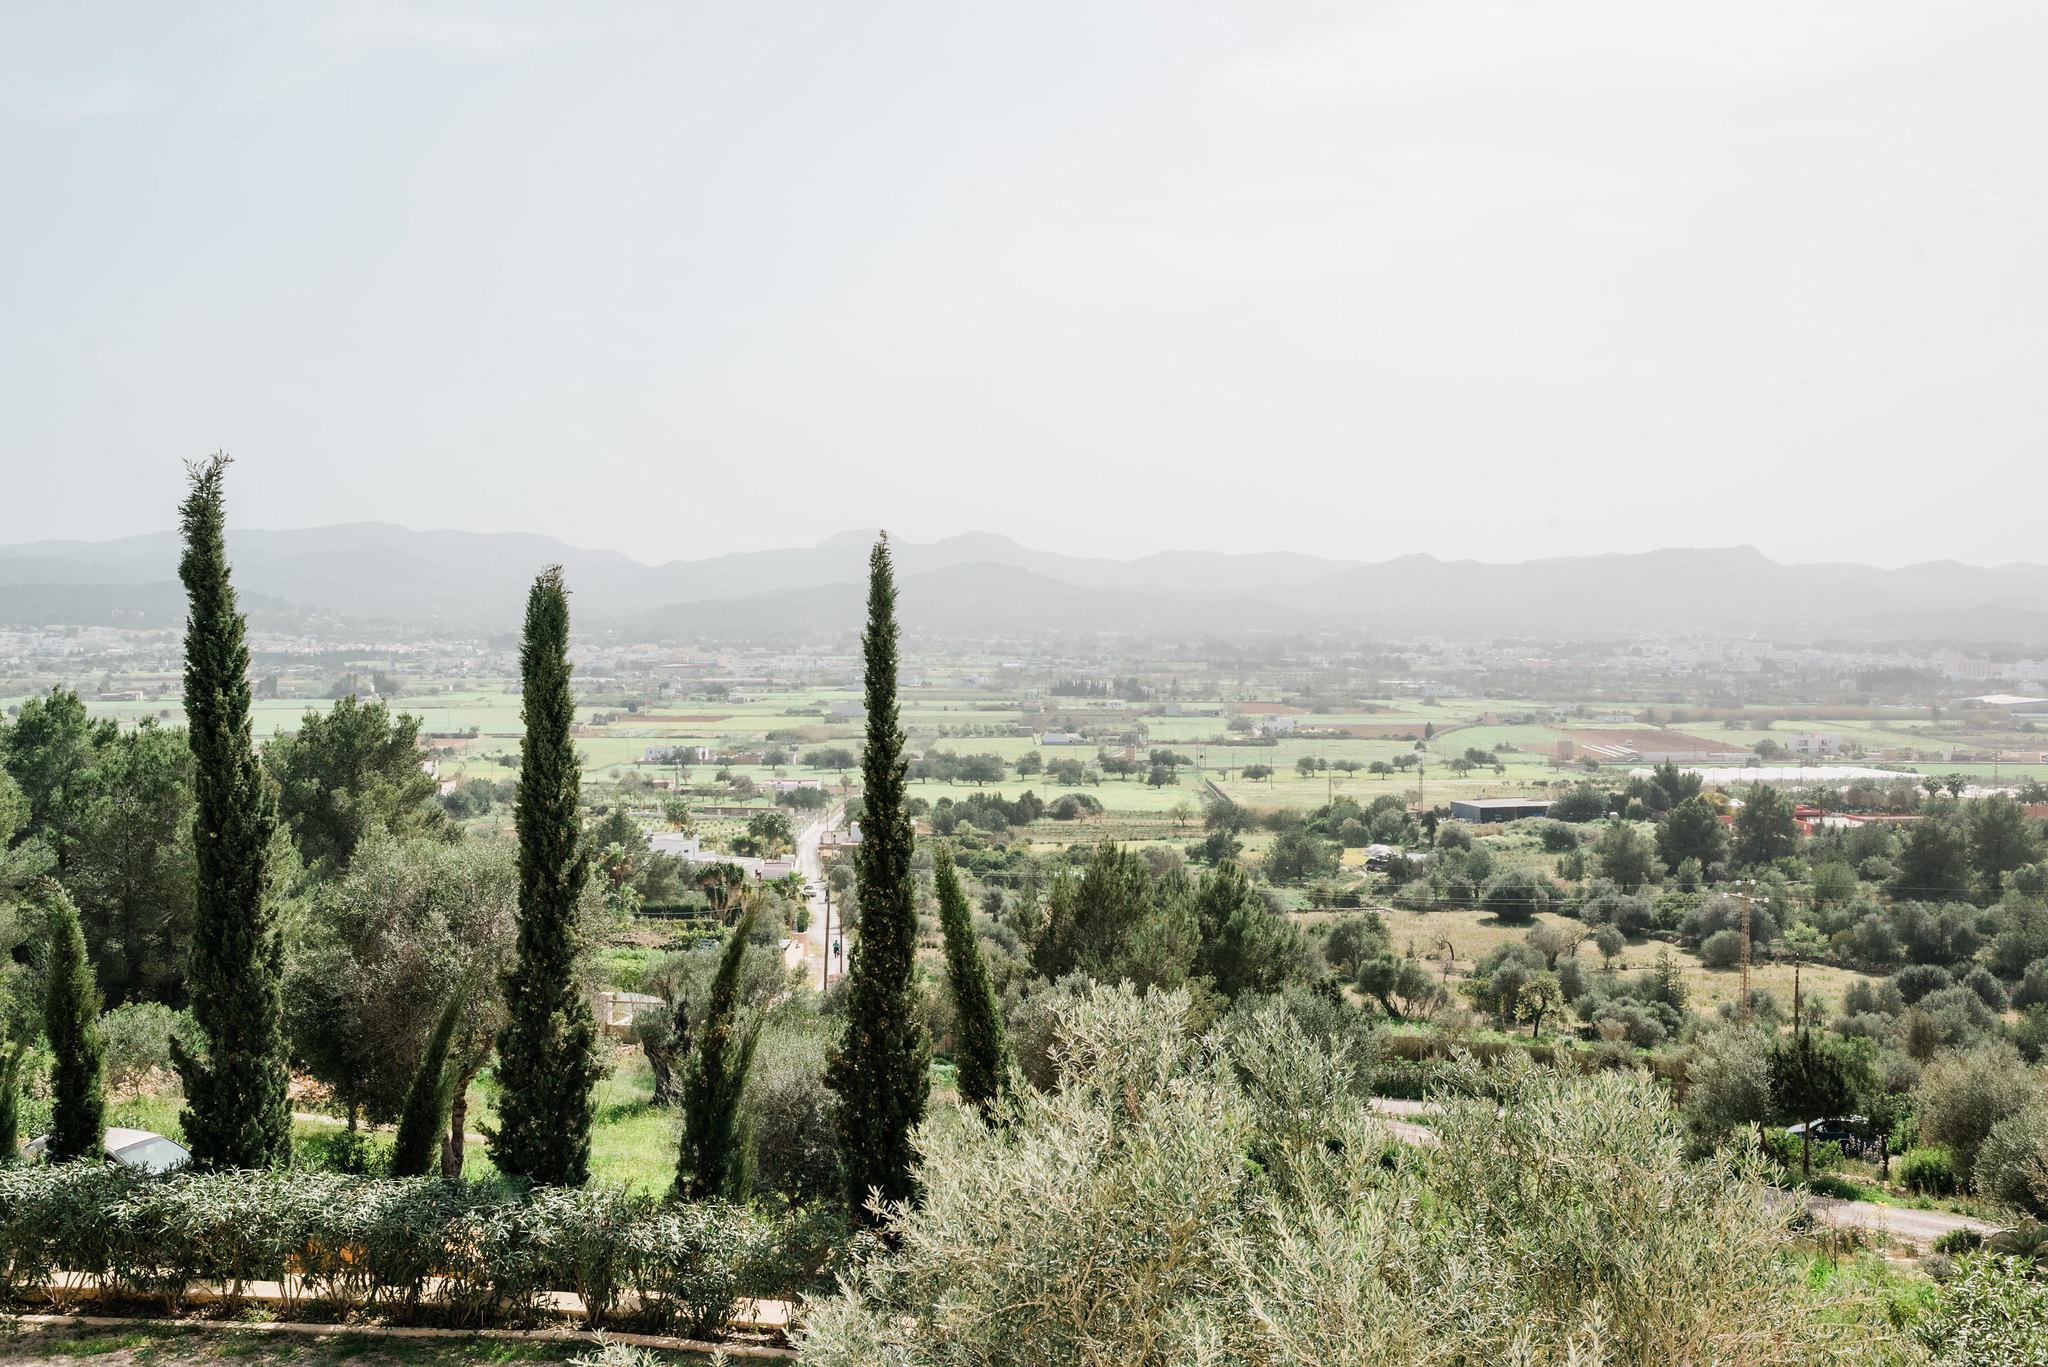 https://www.white-ibiza.com/wp-content/uploads/2020/06/white-ibiza-villas-los-corrales-exterior-view.jpg